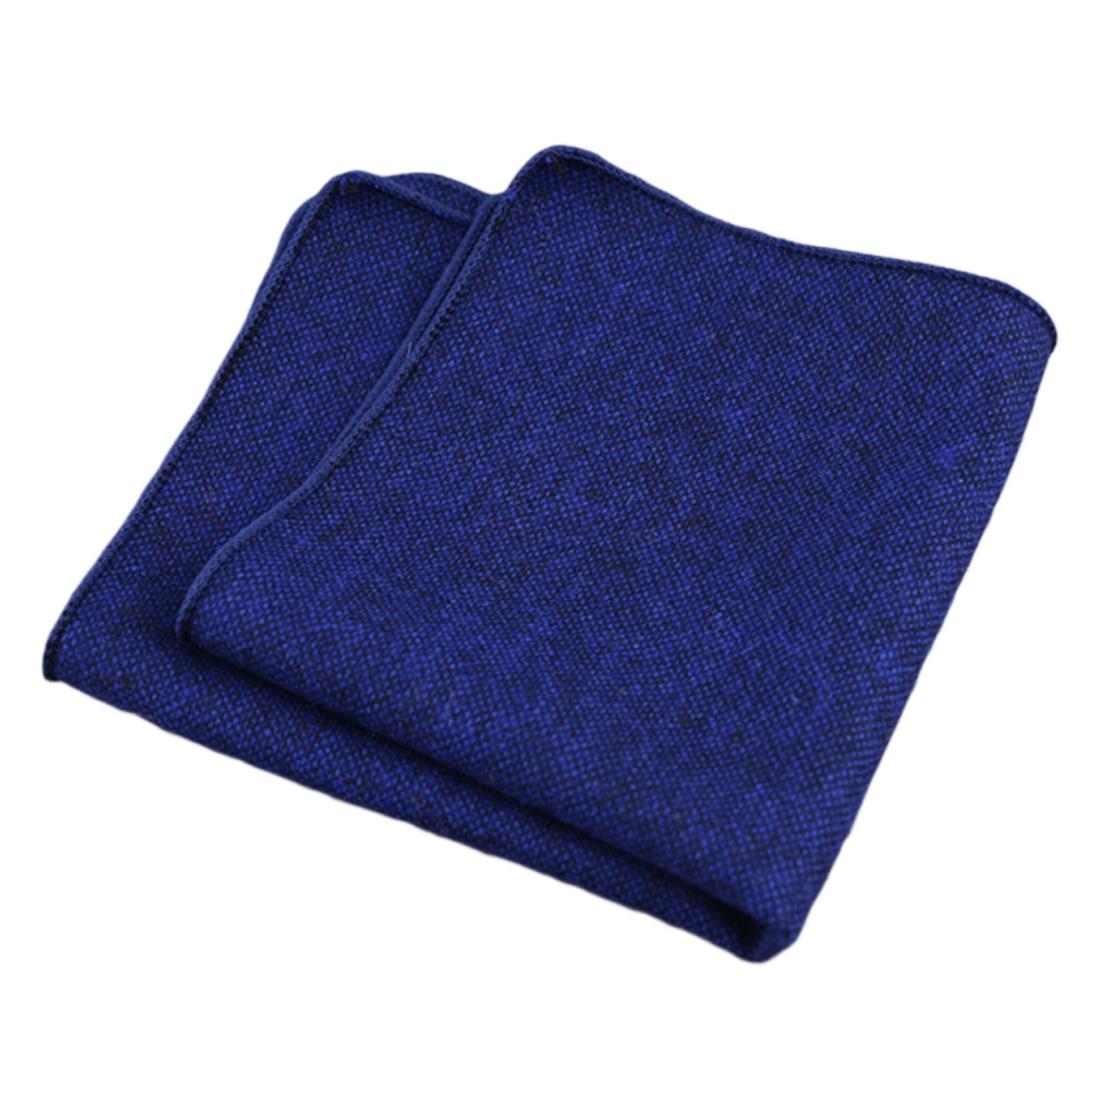 23 23cm High Quality Hankerchief Vintage Suits Solid Pocket Wool Hankies Men 39 s Pocket Square Handkerchiefs Striped Solid Cotton in Men 39 s Ties amp Handkerchiefs from Apparel Accessories